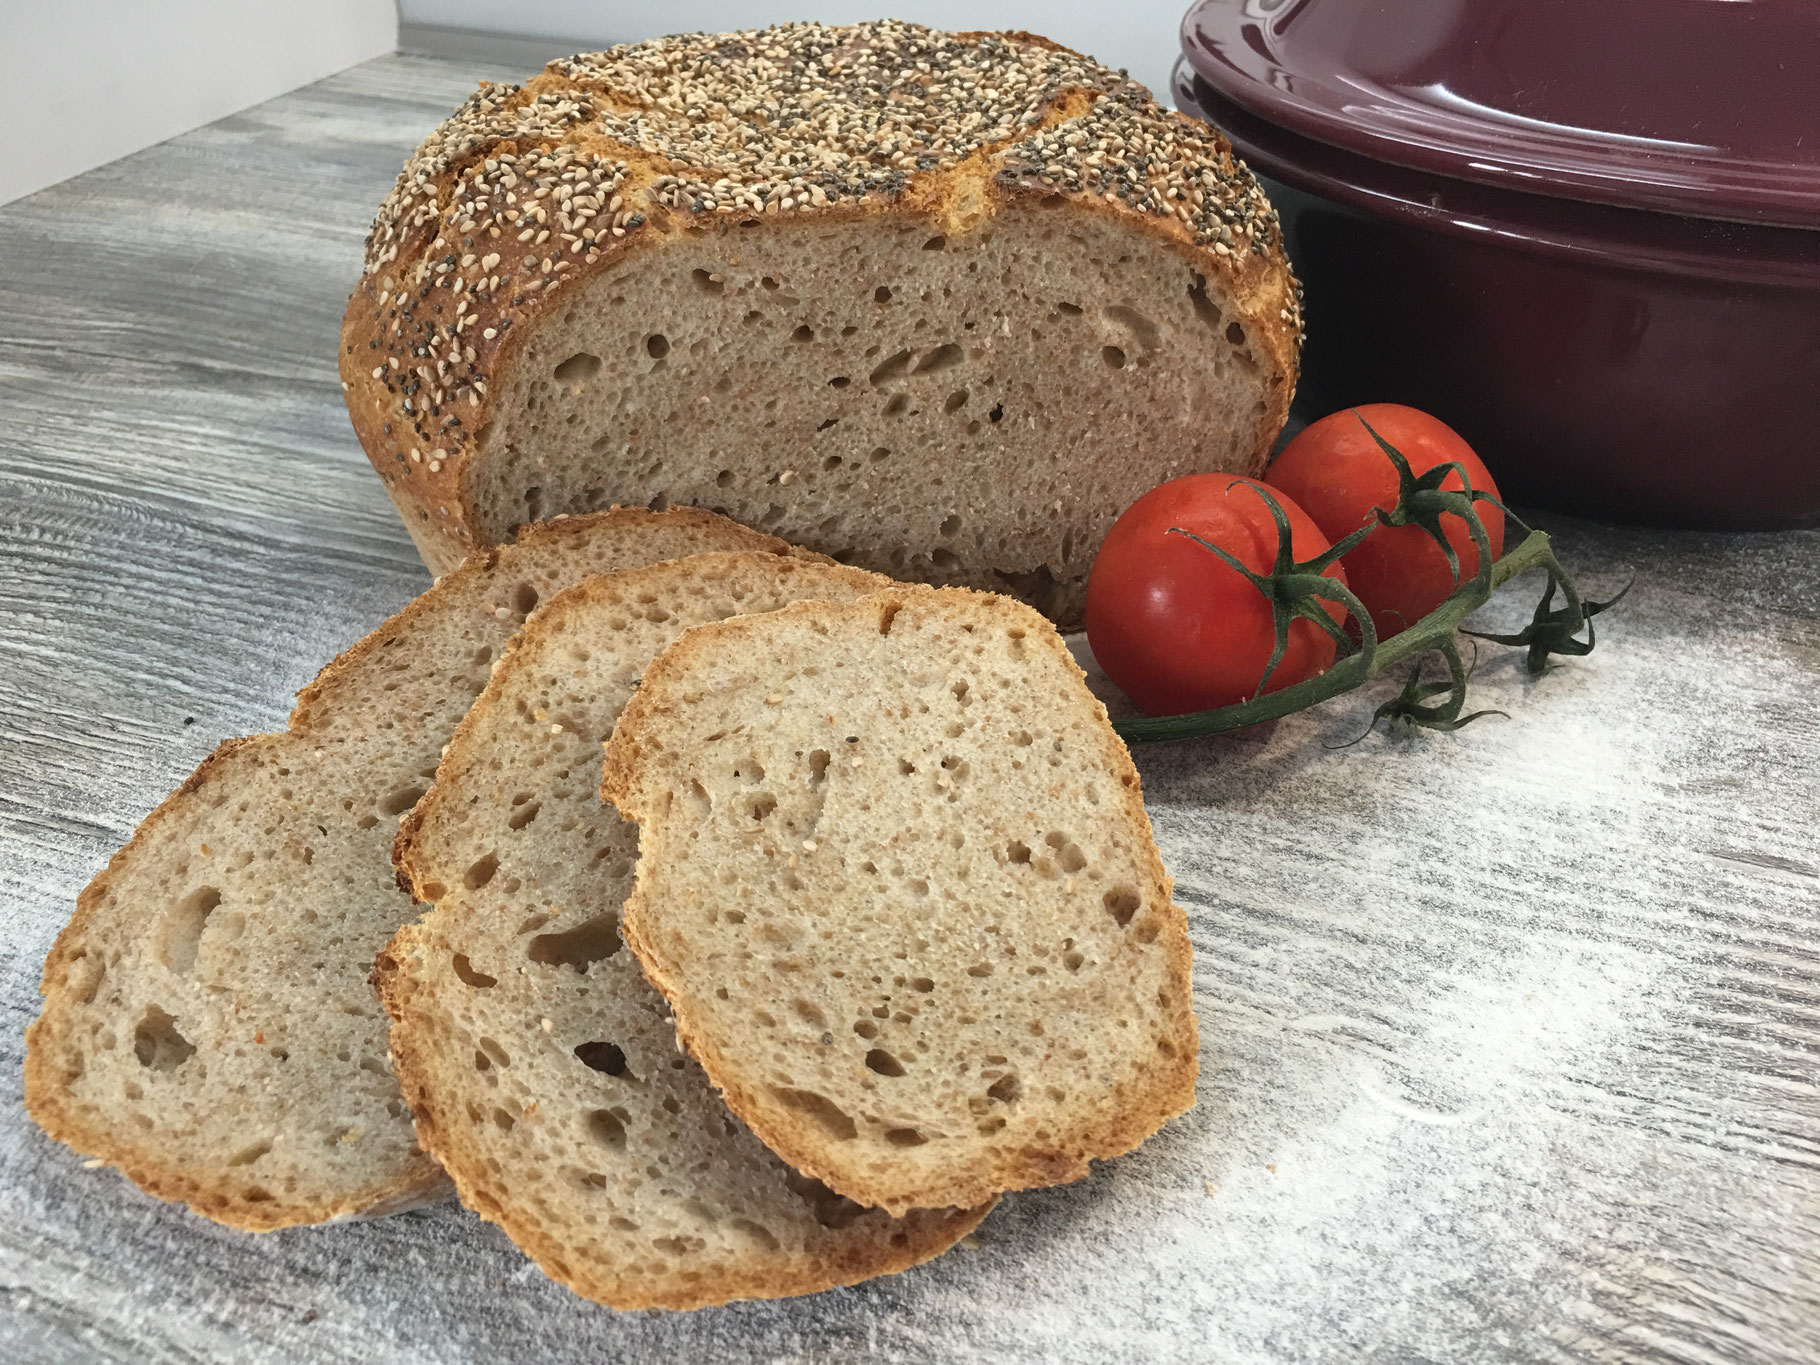 Leckere Weizenkruste mit Sesam/Chia Topping